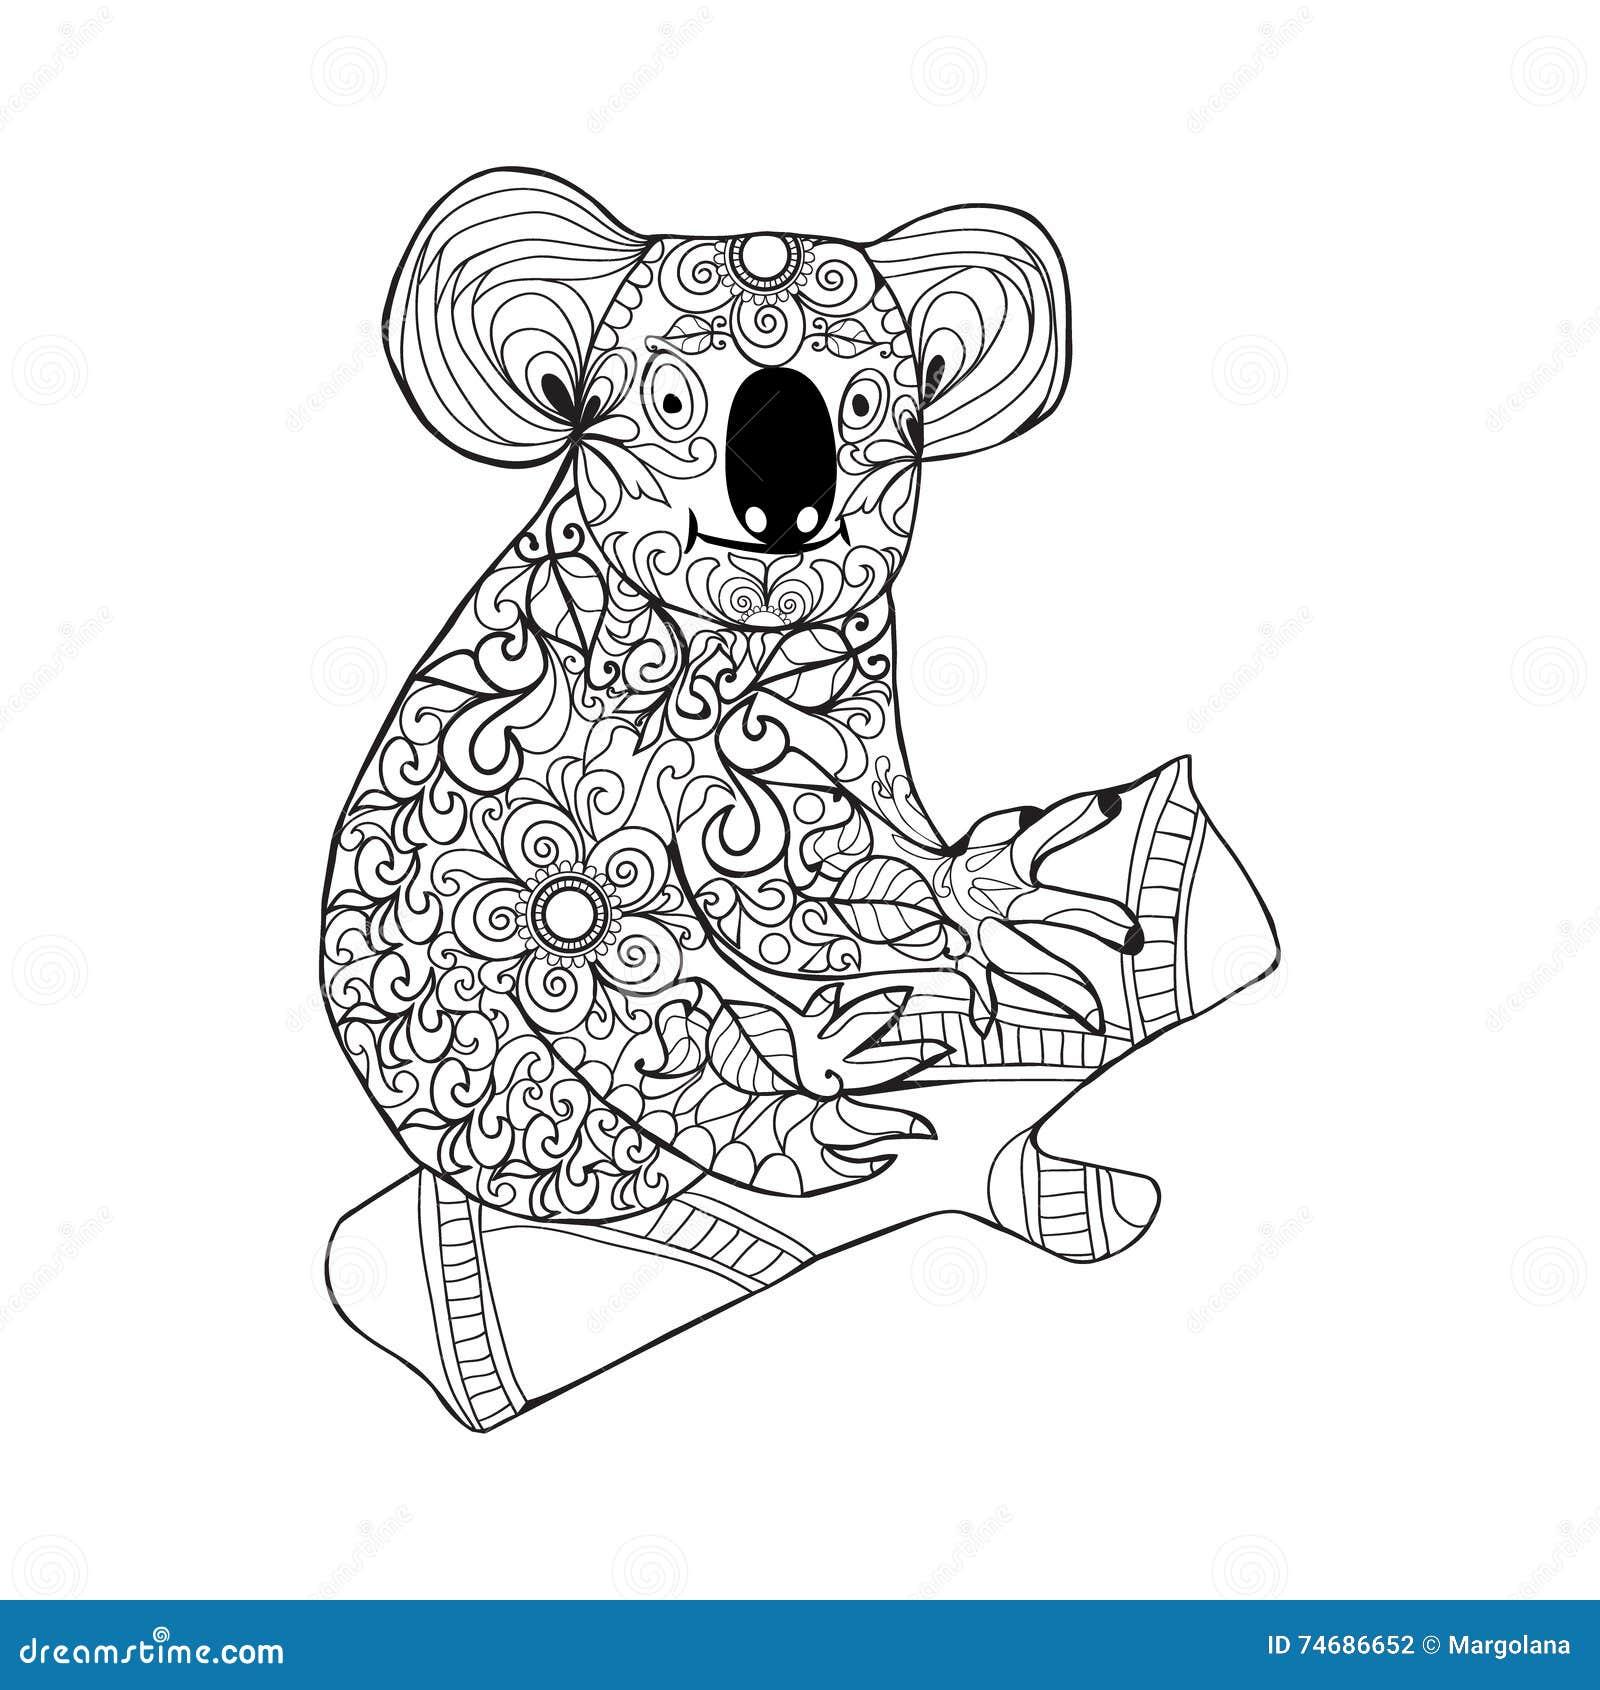 Drawing Zentangle Koala For Coloring Page Shirt Design